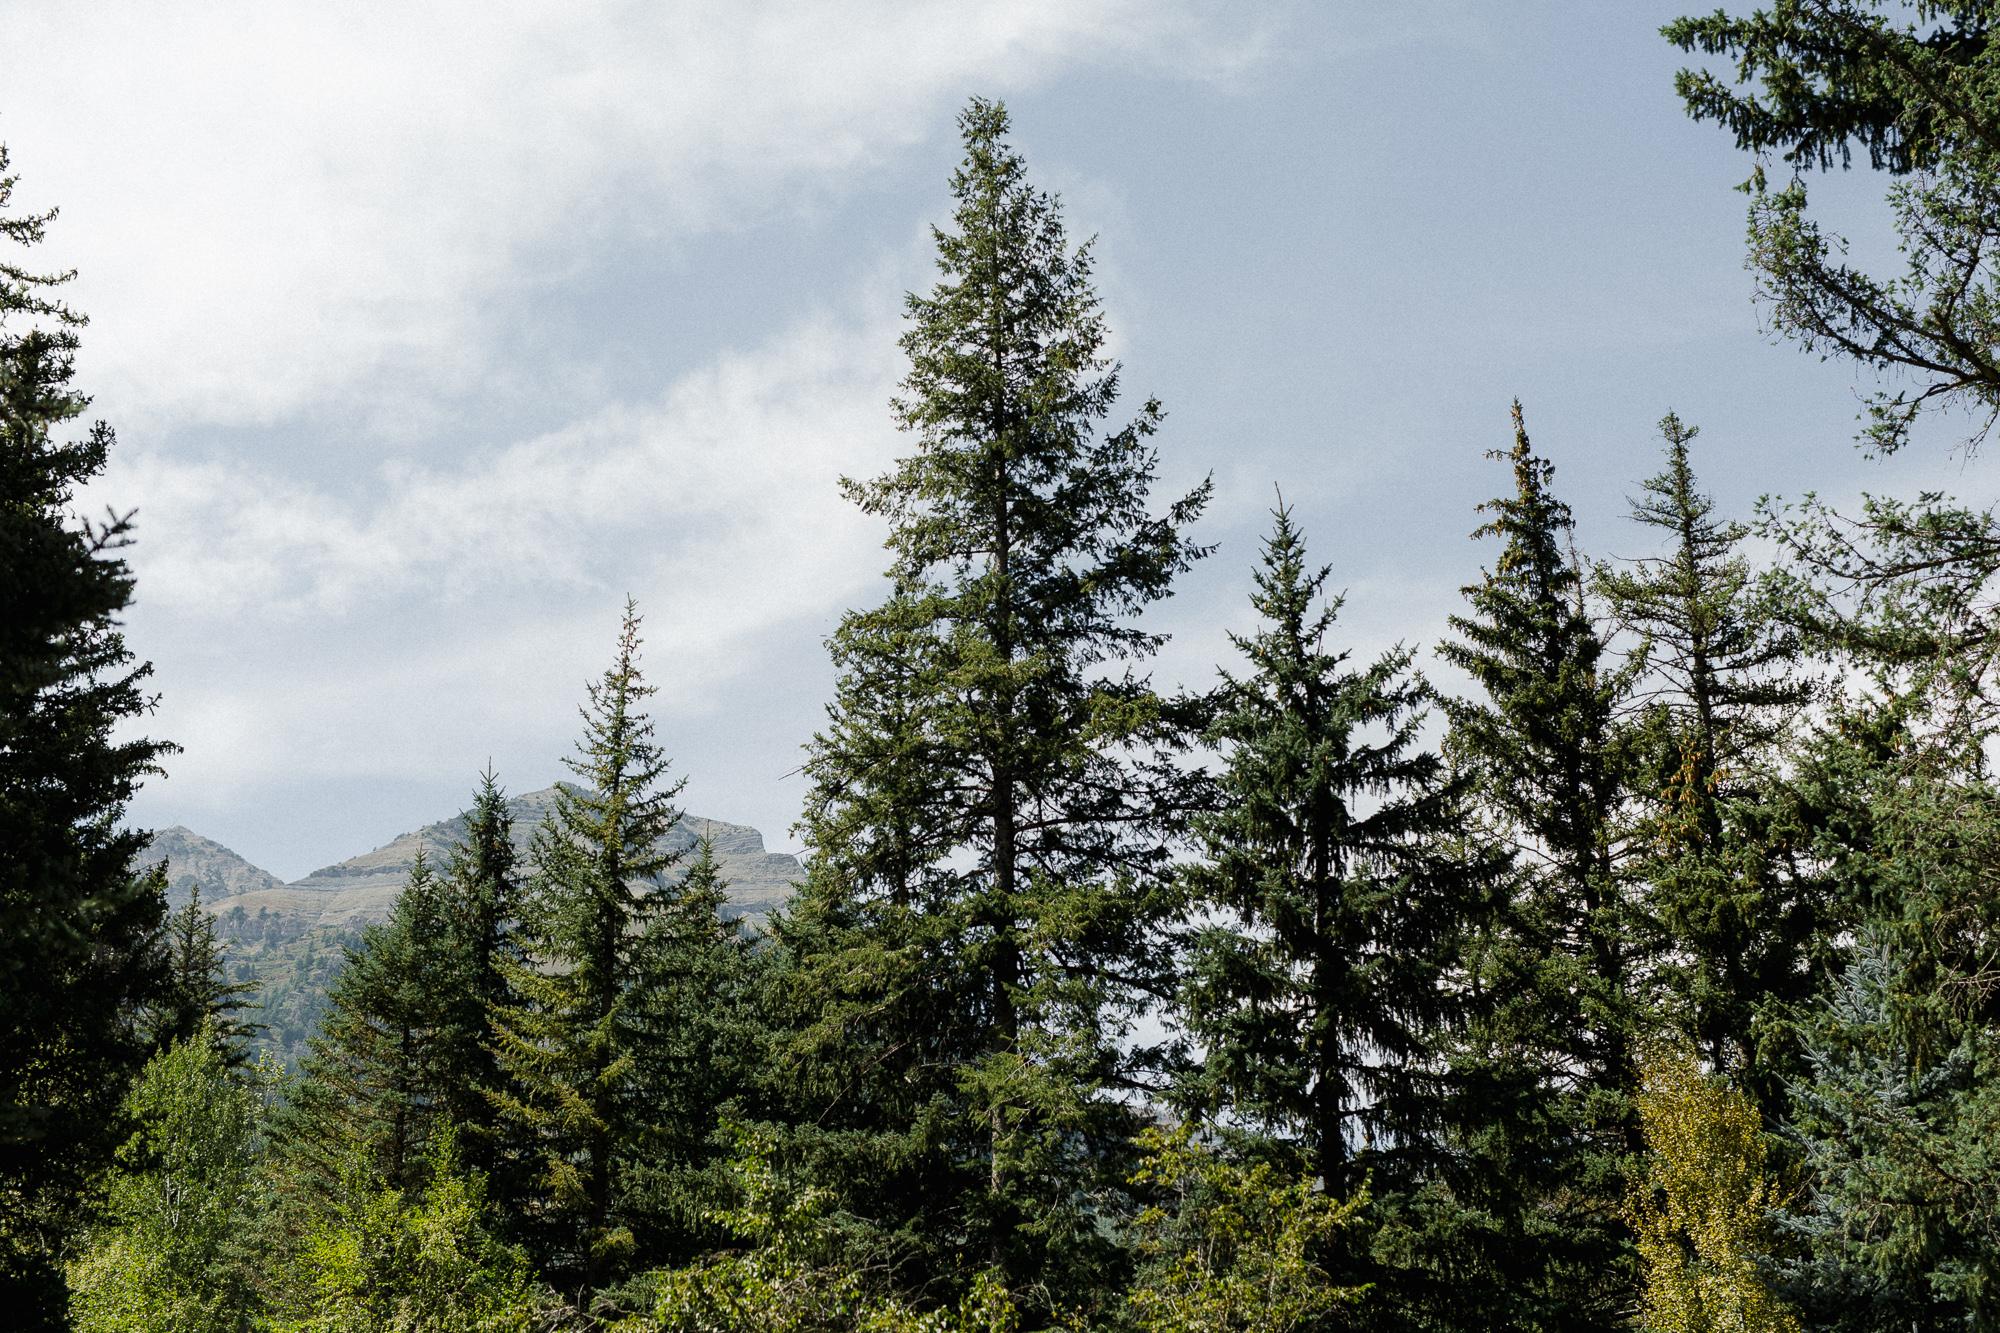 Sundance Resort Pine Trees.